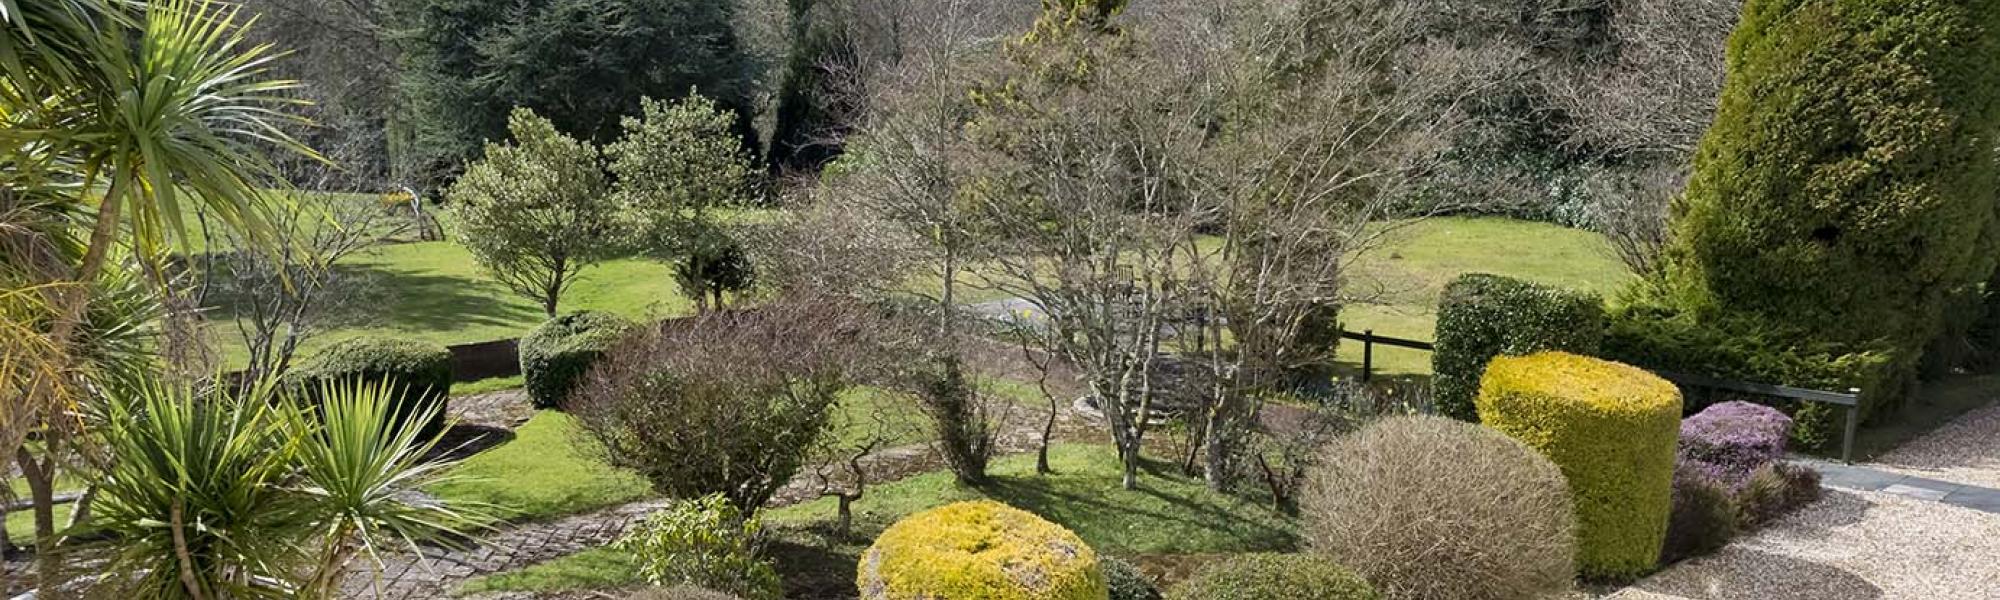 brighterkind The Cedars in Salisbury